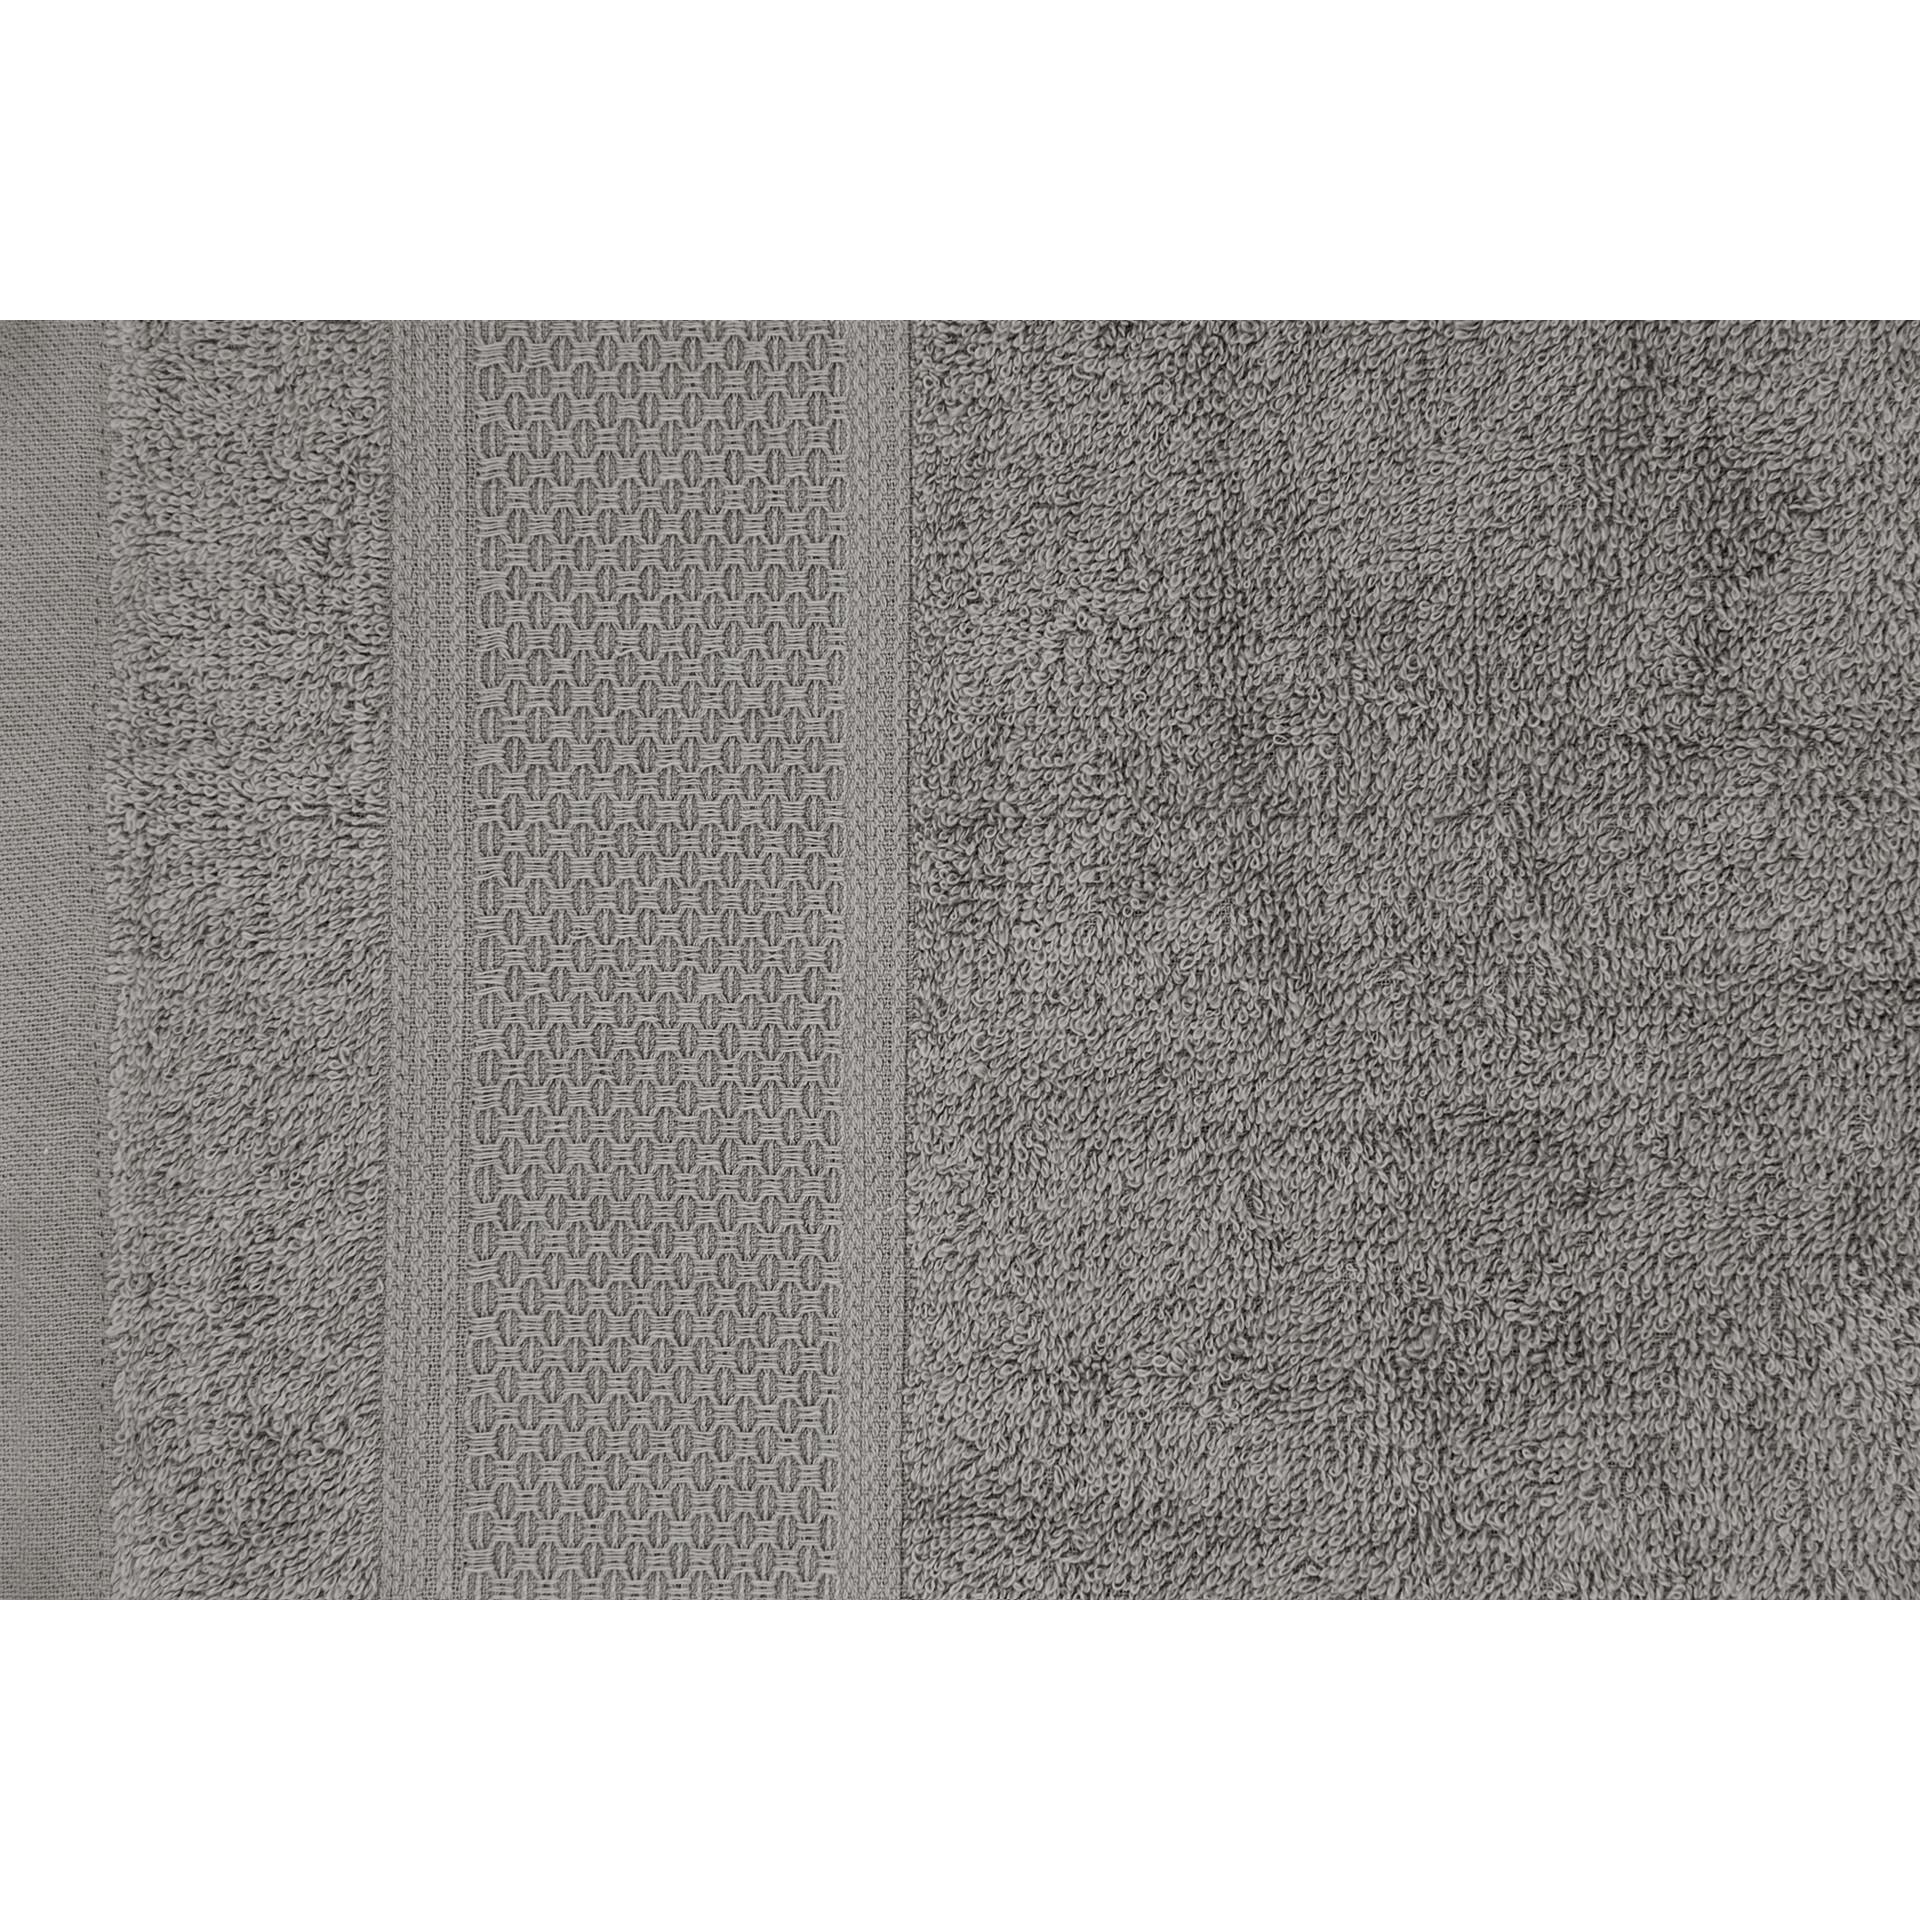 Badetuch James | Grau | 3er-Set